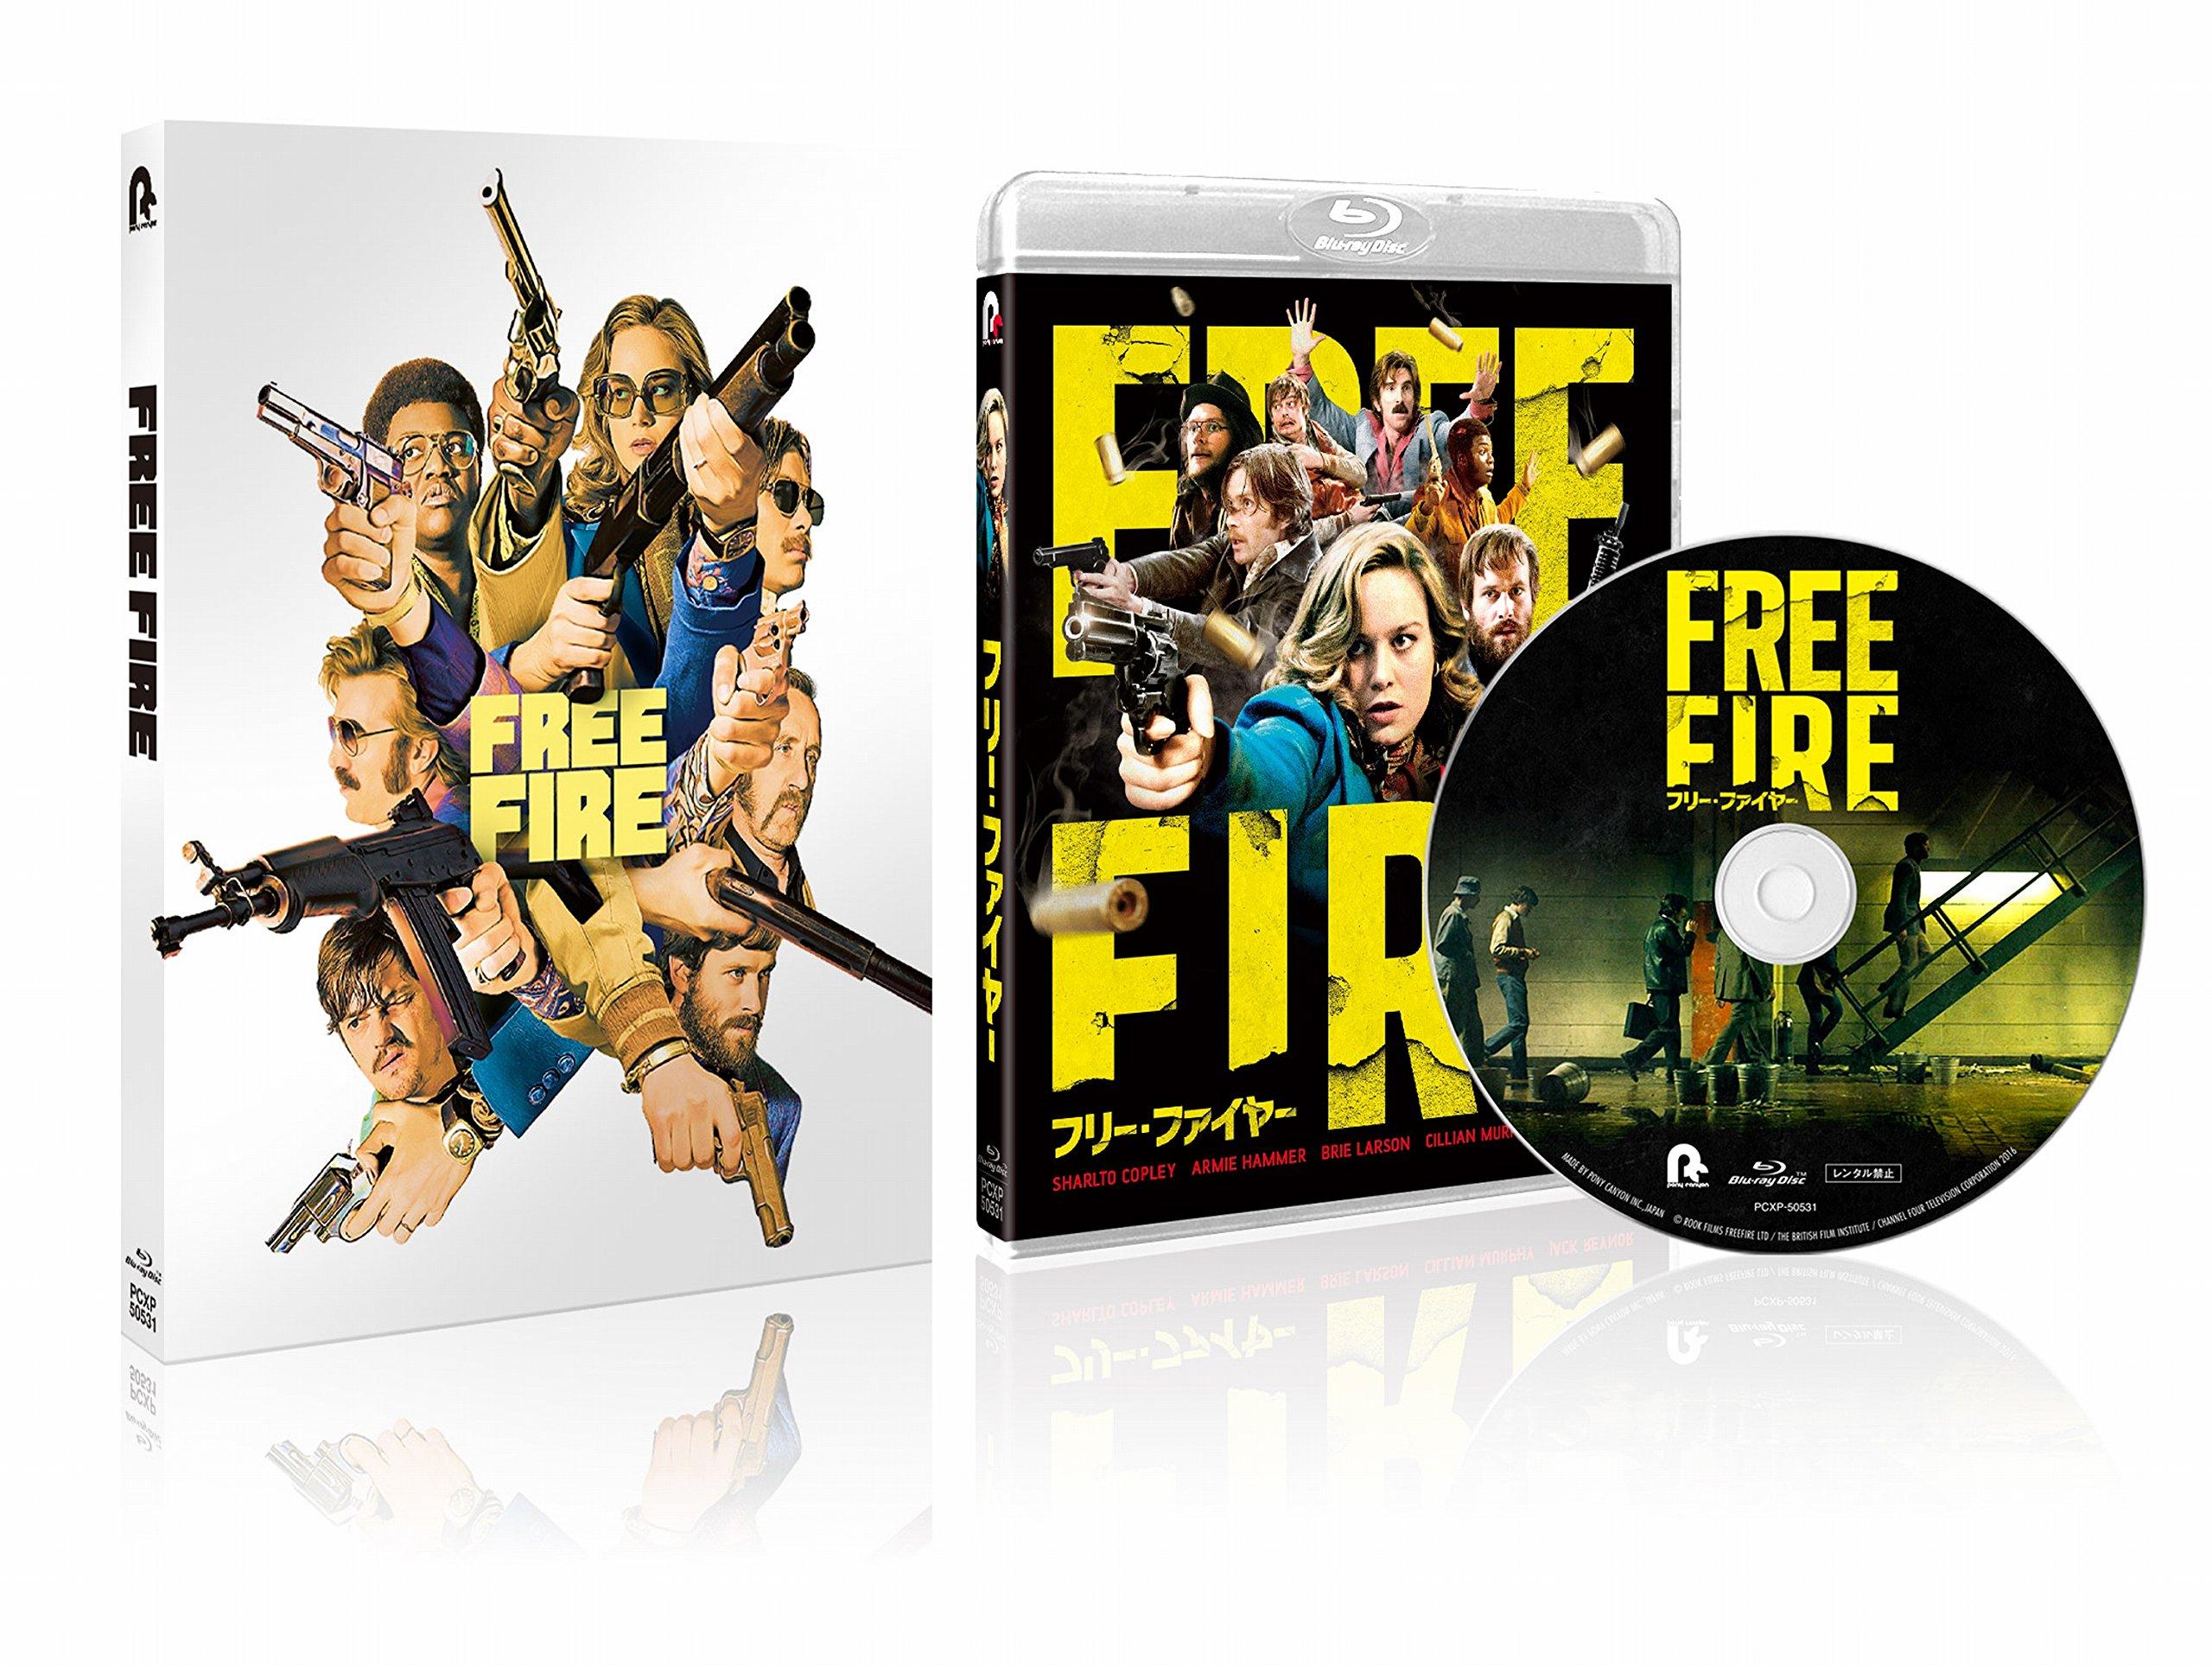 Free, Fire [Blu-ray]